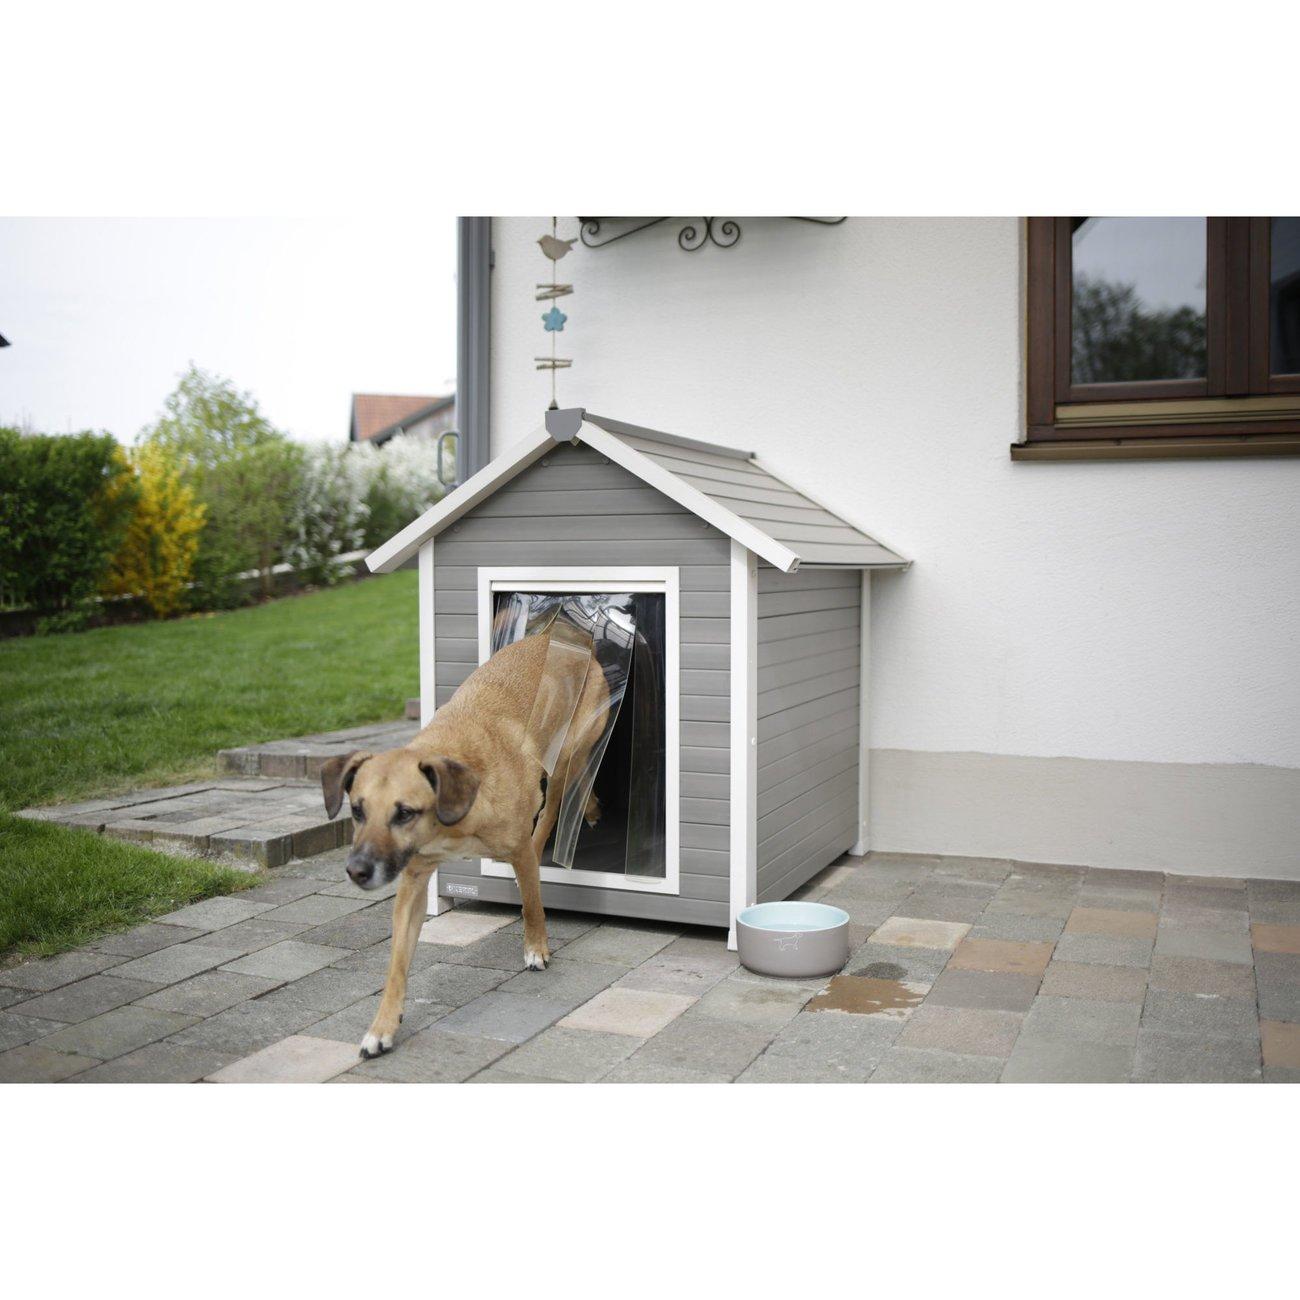 Kerbl Eco-Hundehütte Hendry, Bild 6